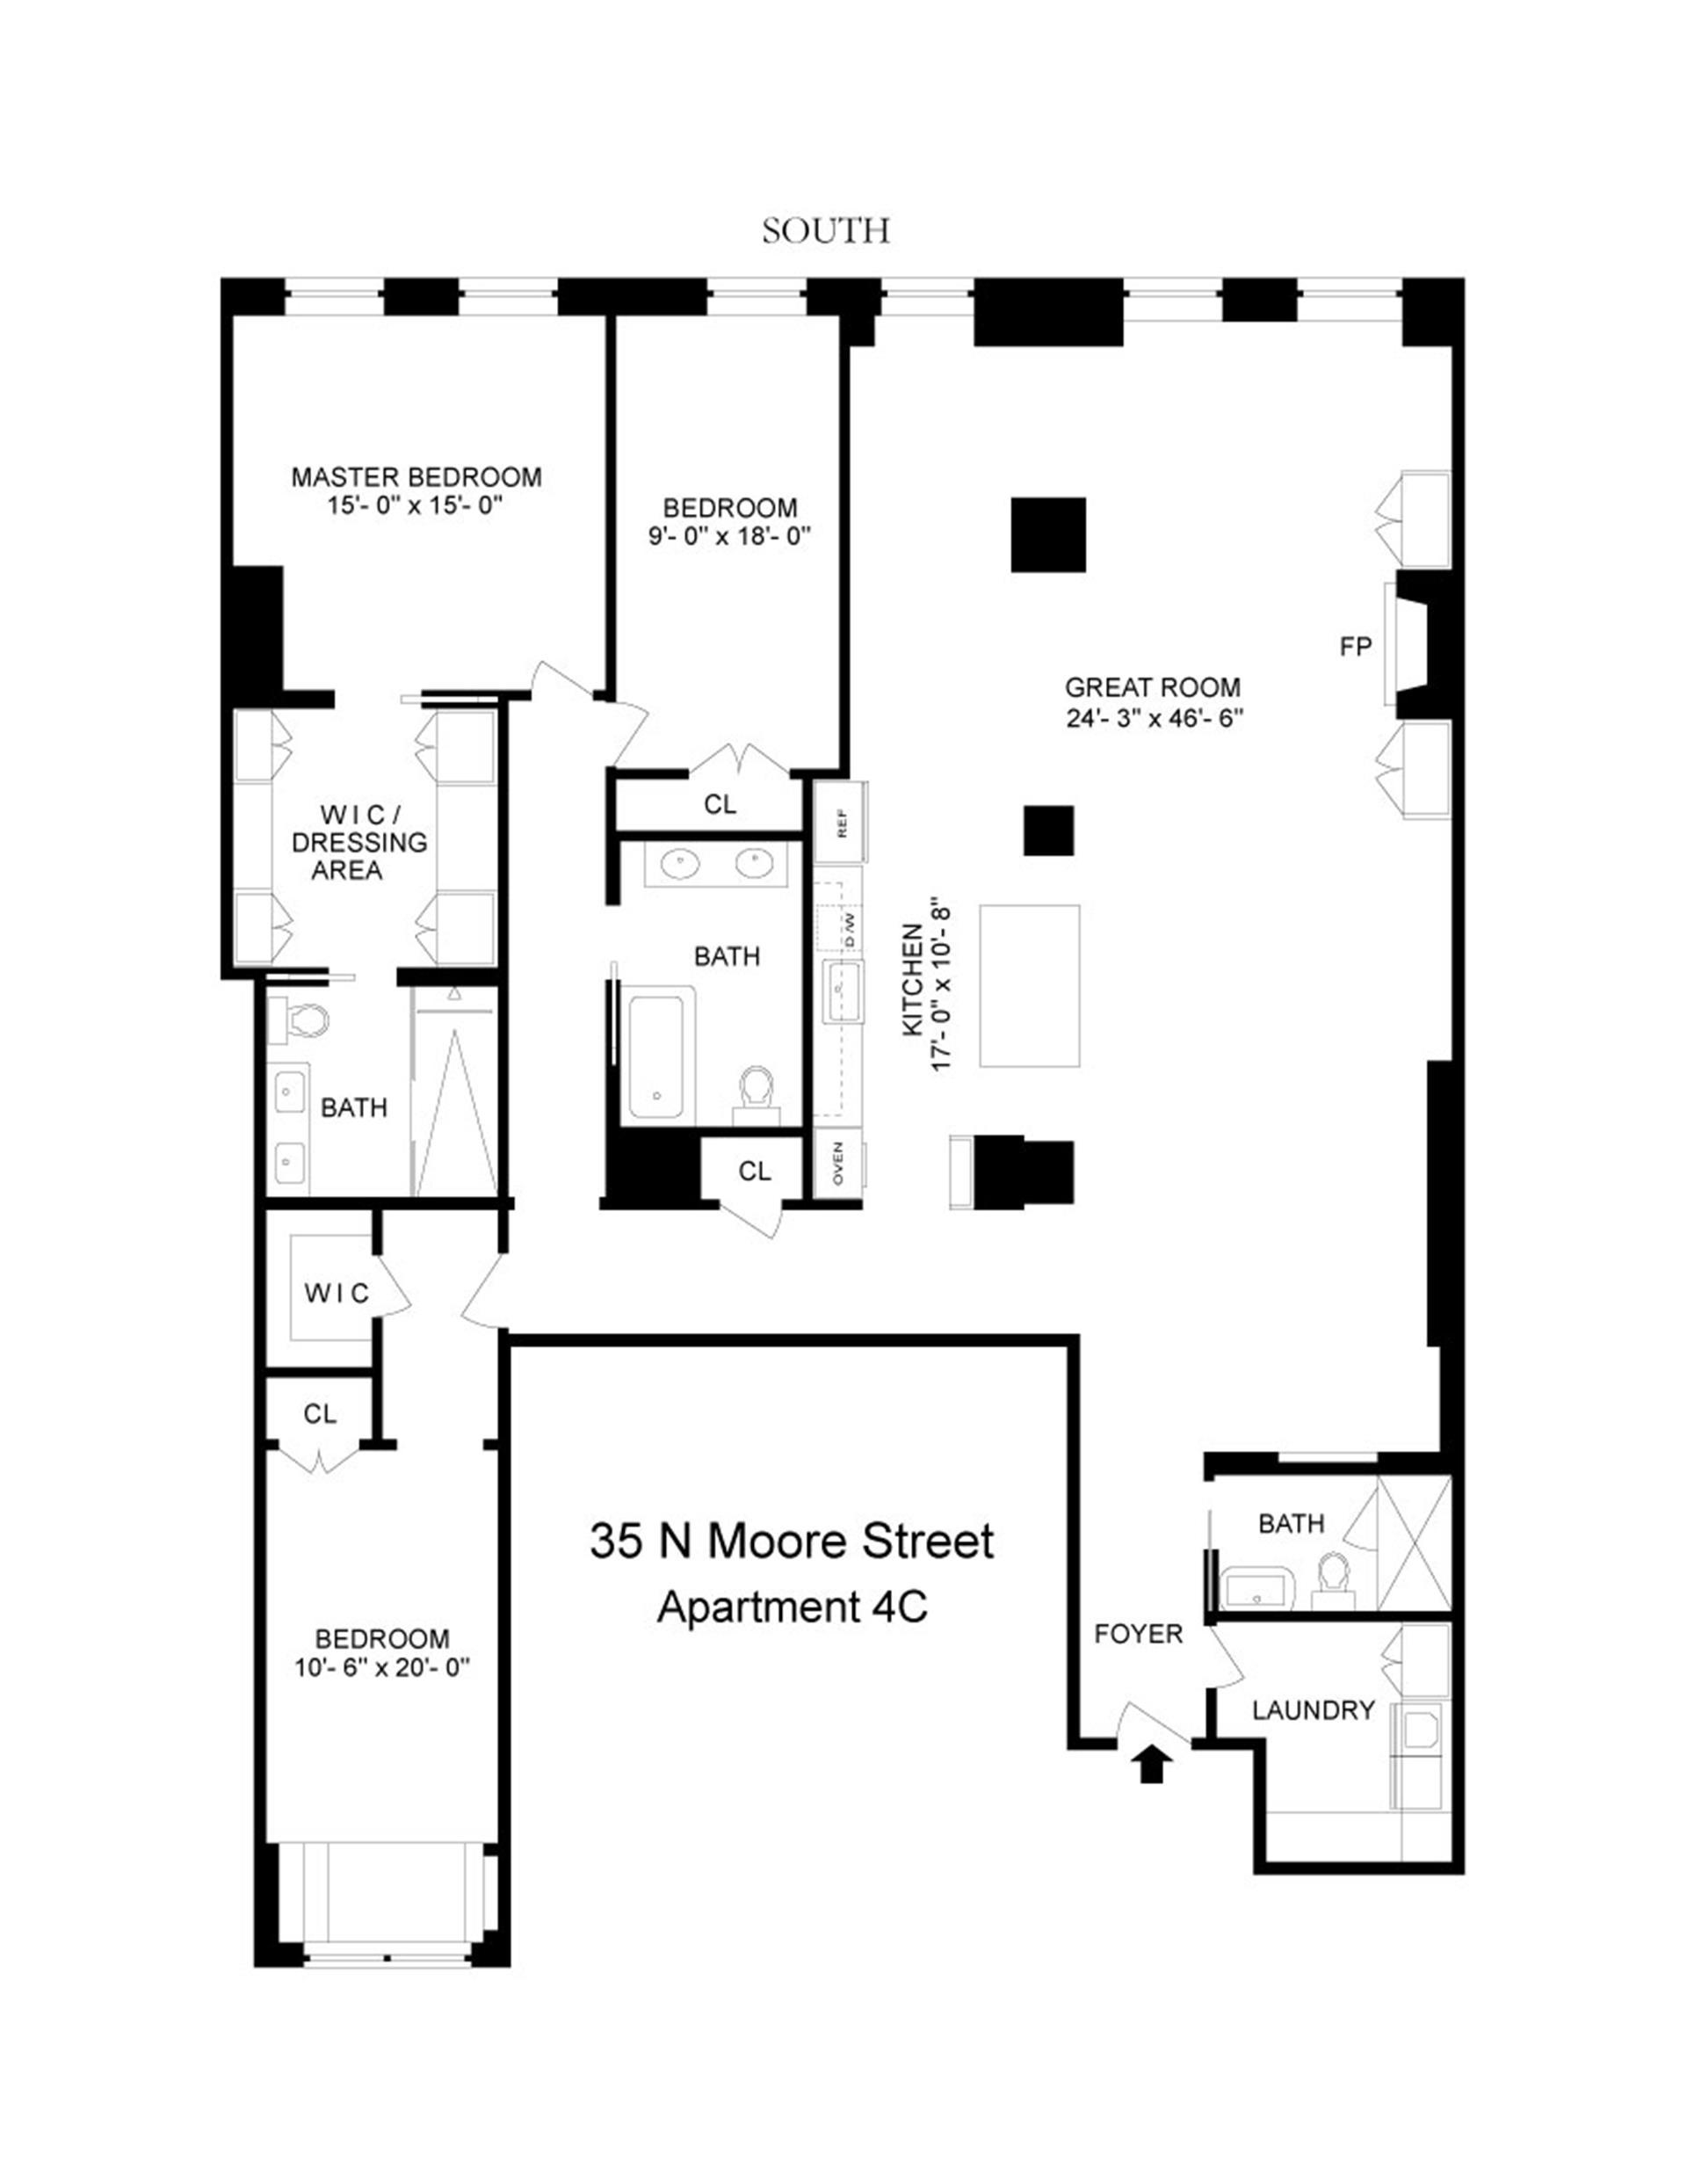 Floor plan of Merchant House, 35 North Moore St, 4C - TriBeCa, New York